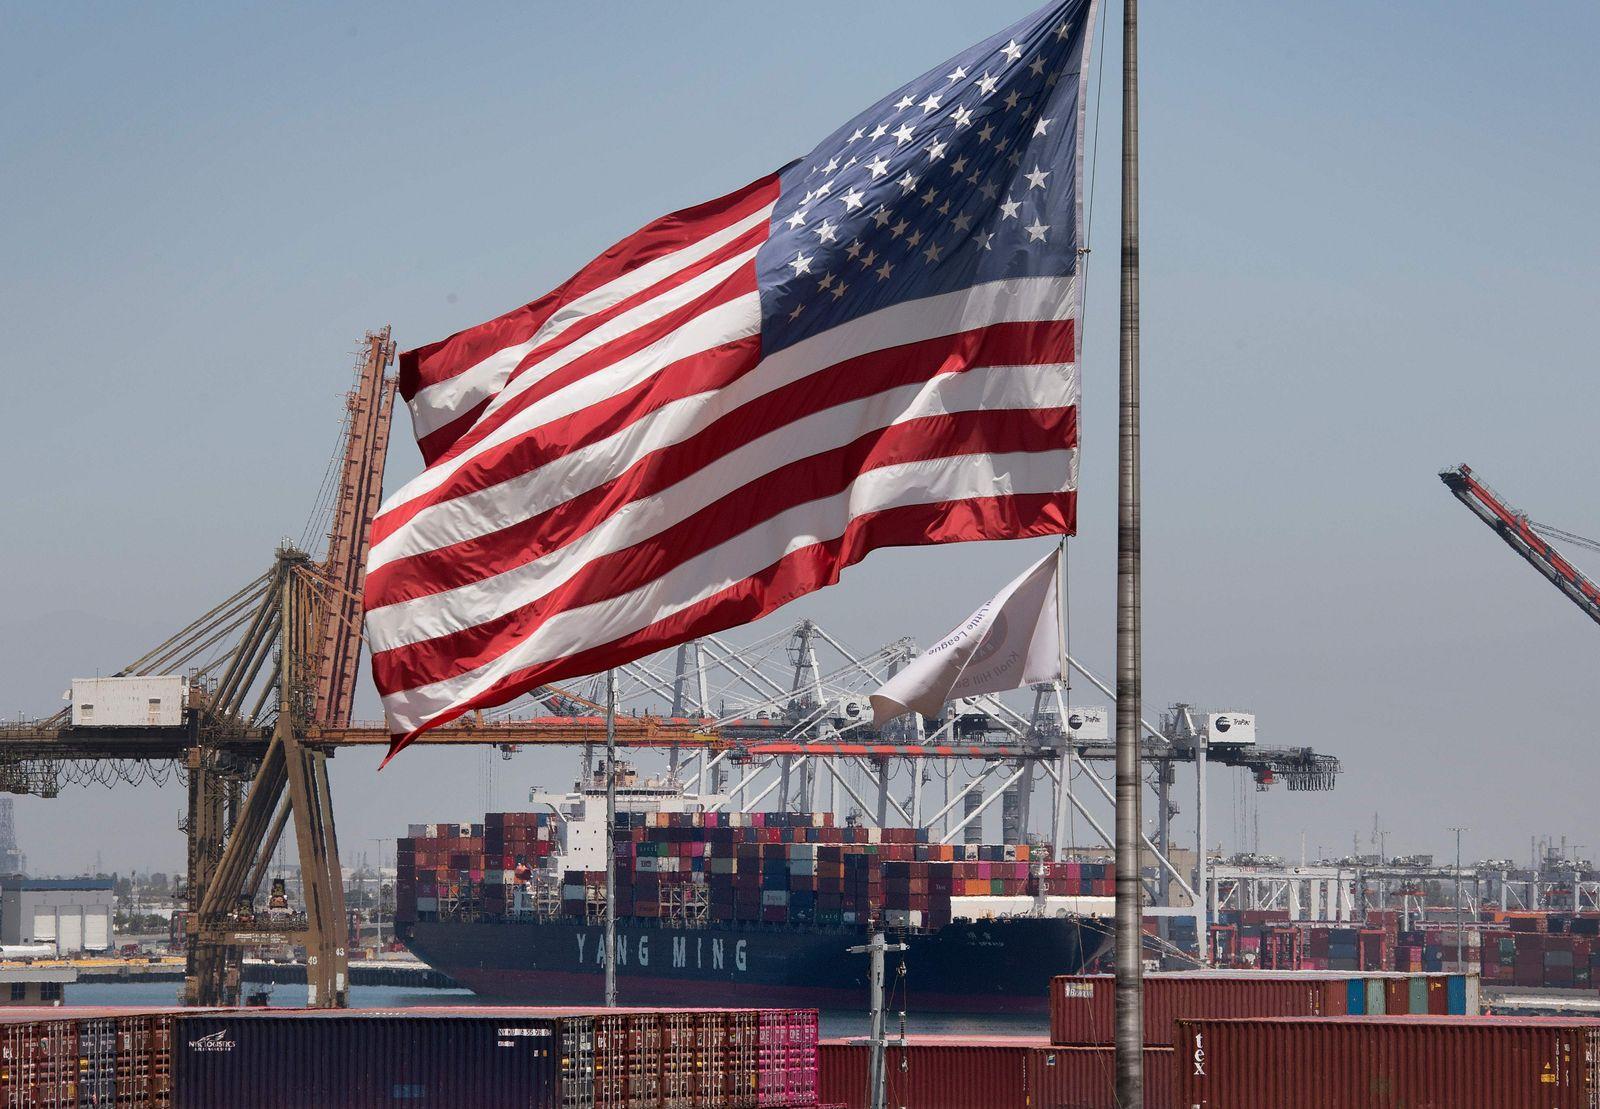 USA China Handelsstreit